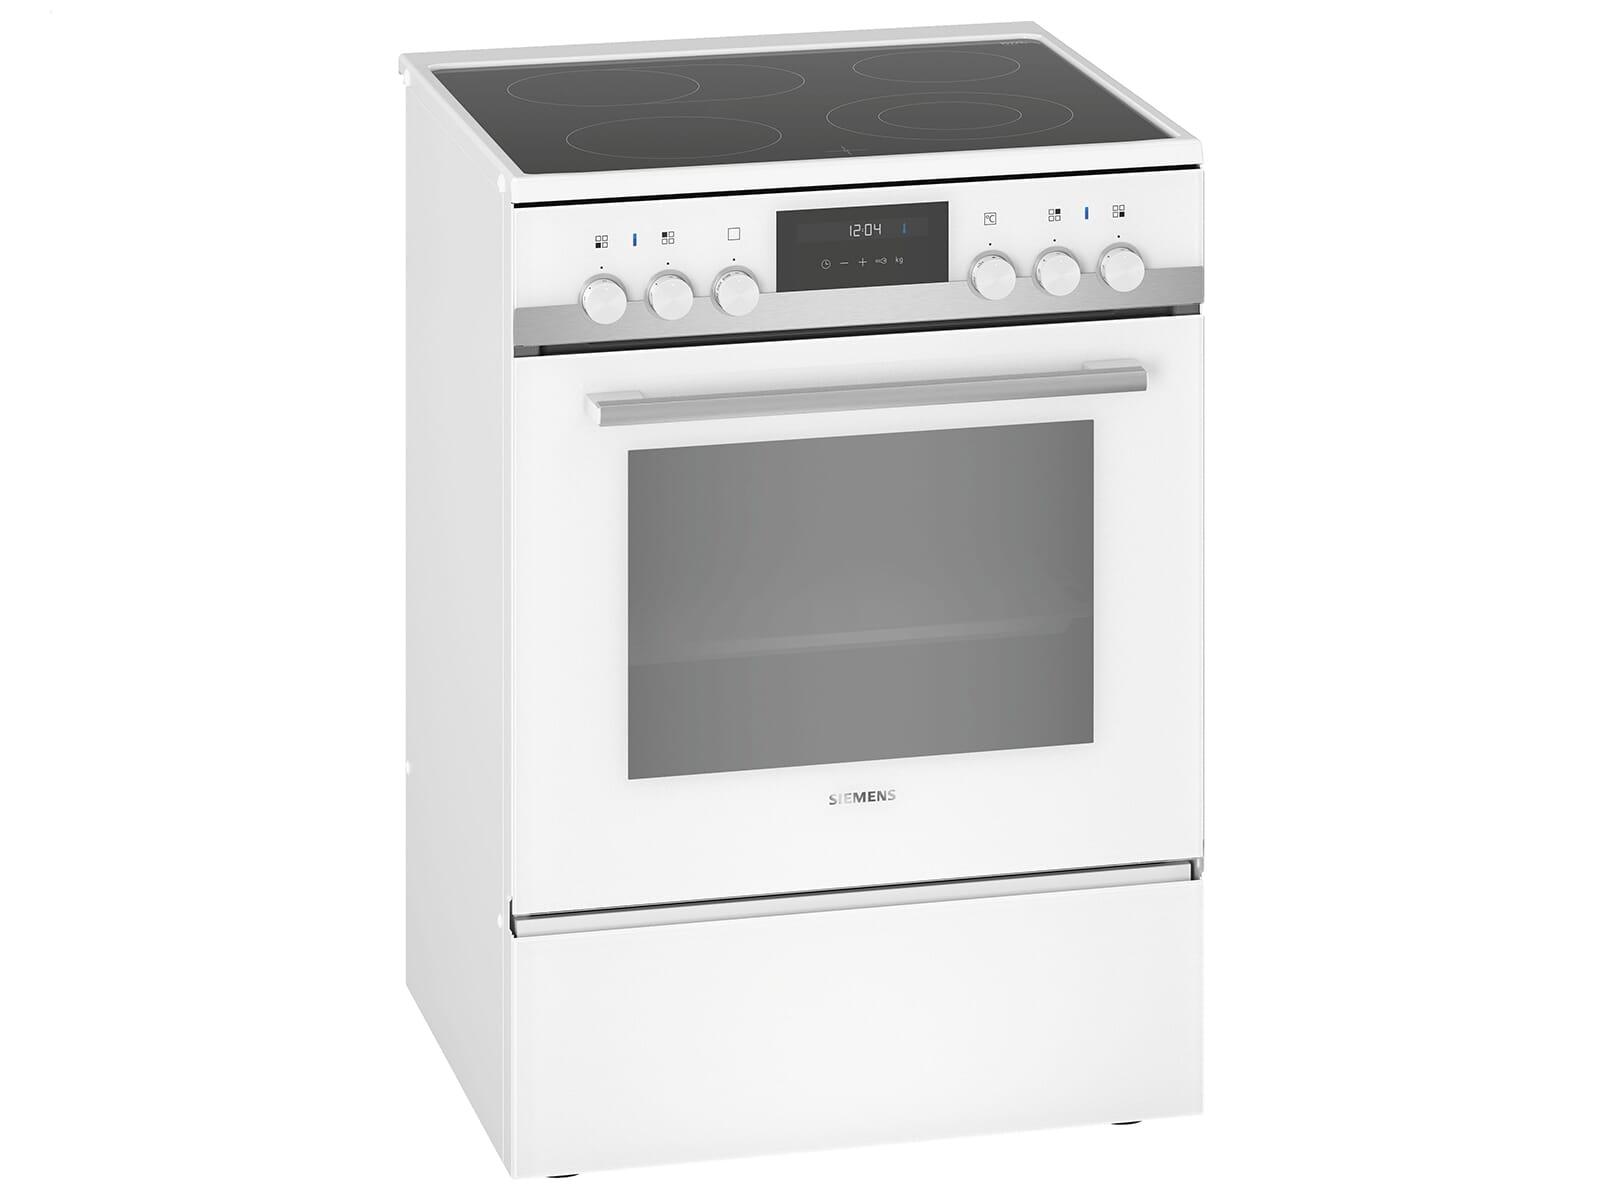 Siemens HK9S5A220 Standherd Weiß